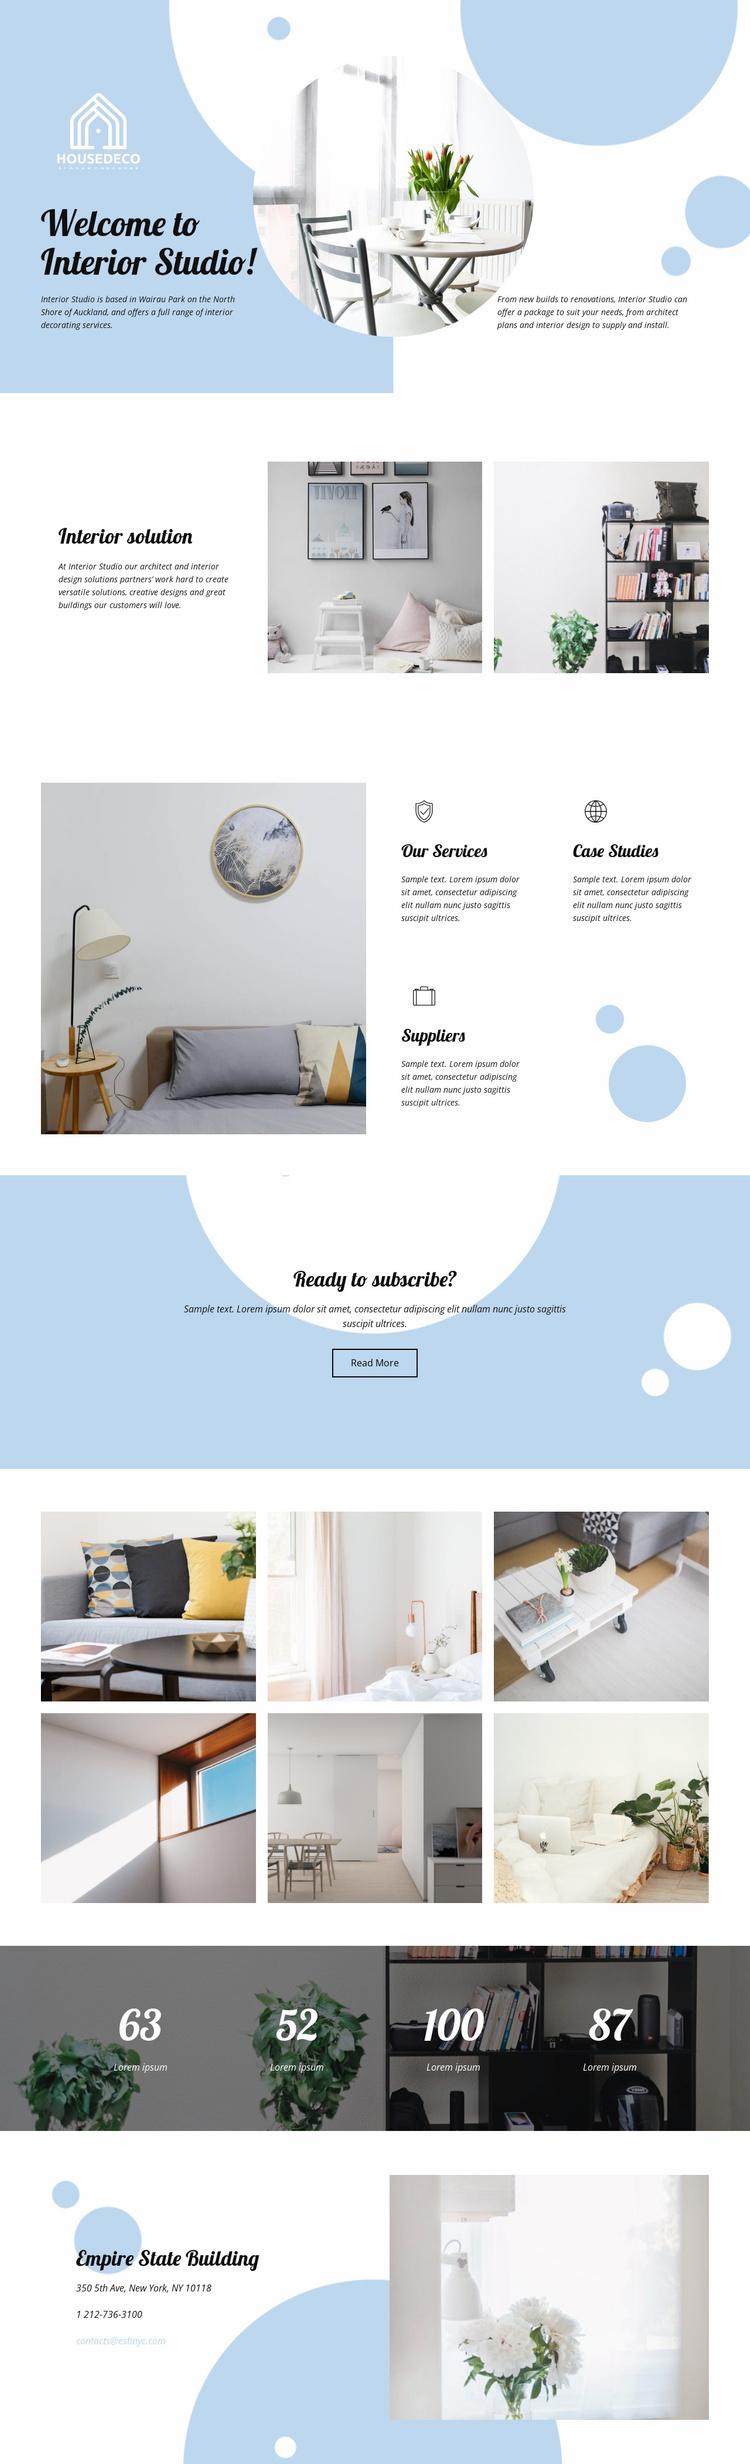 Interior Studio Website Template